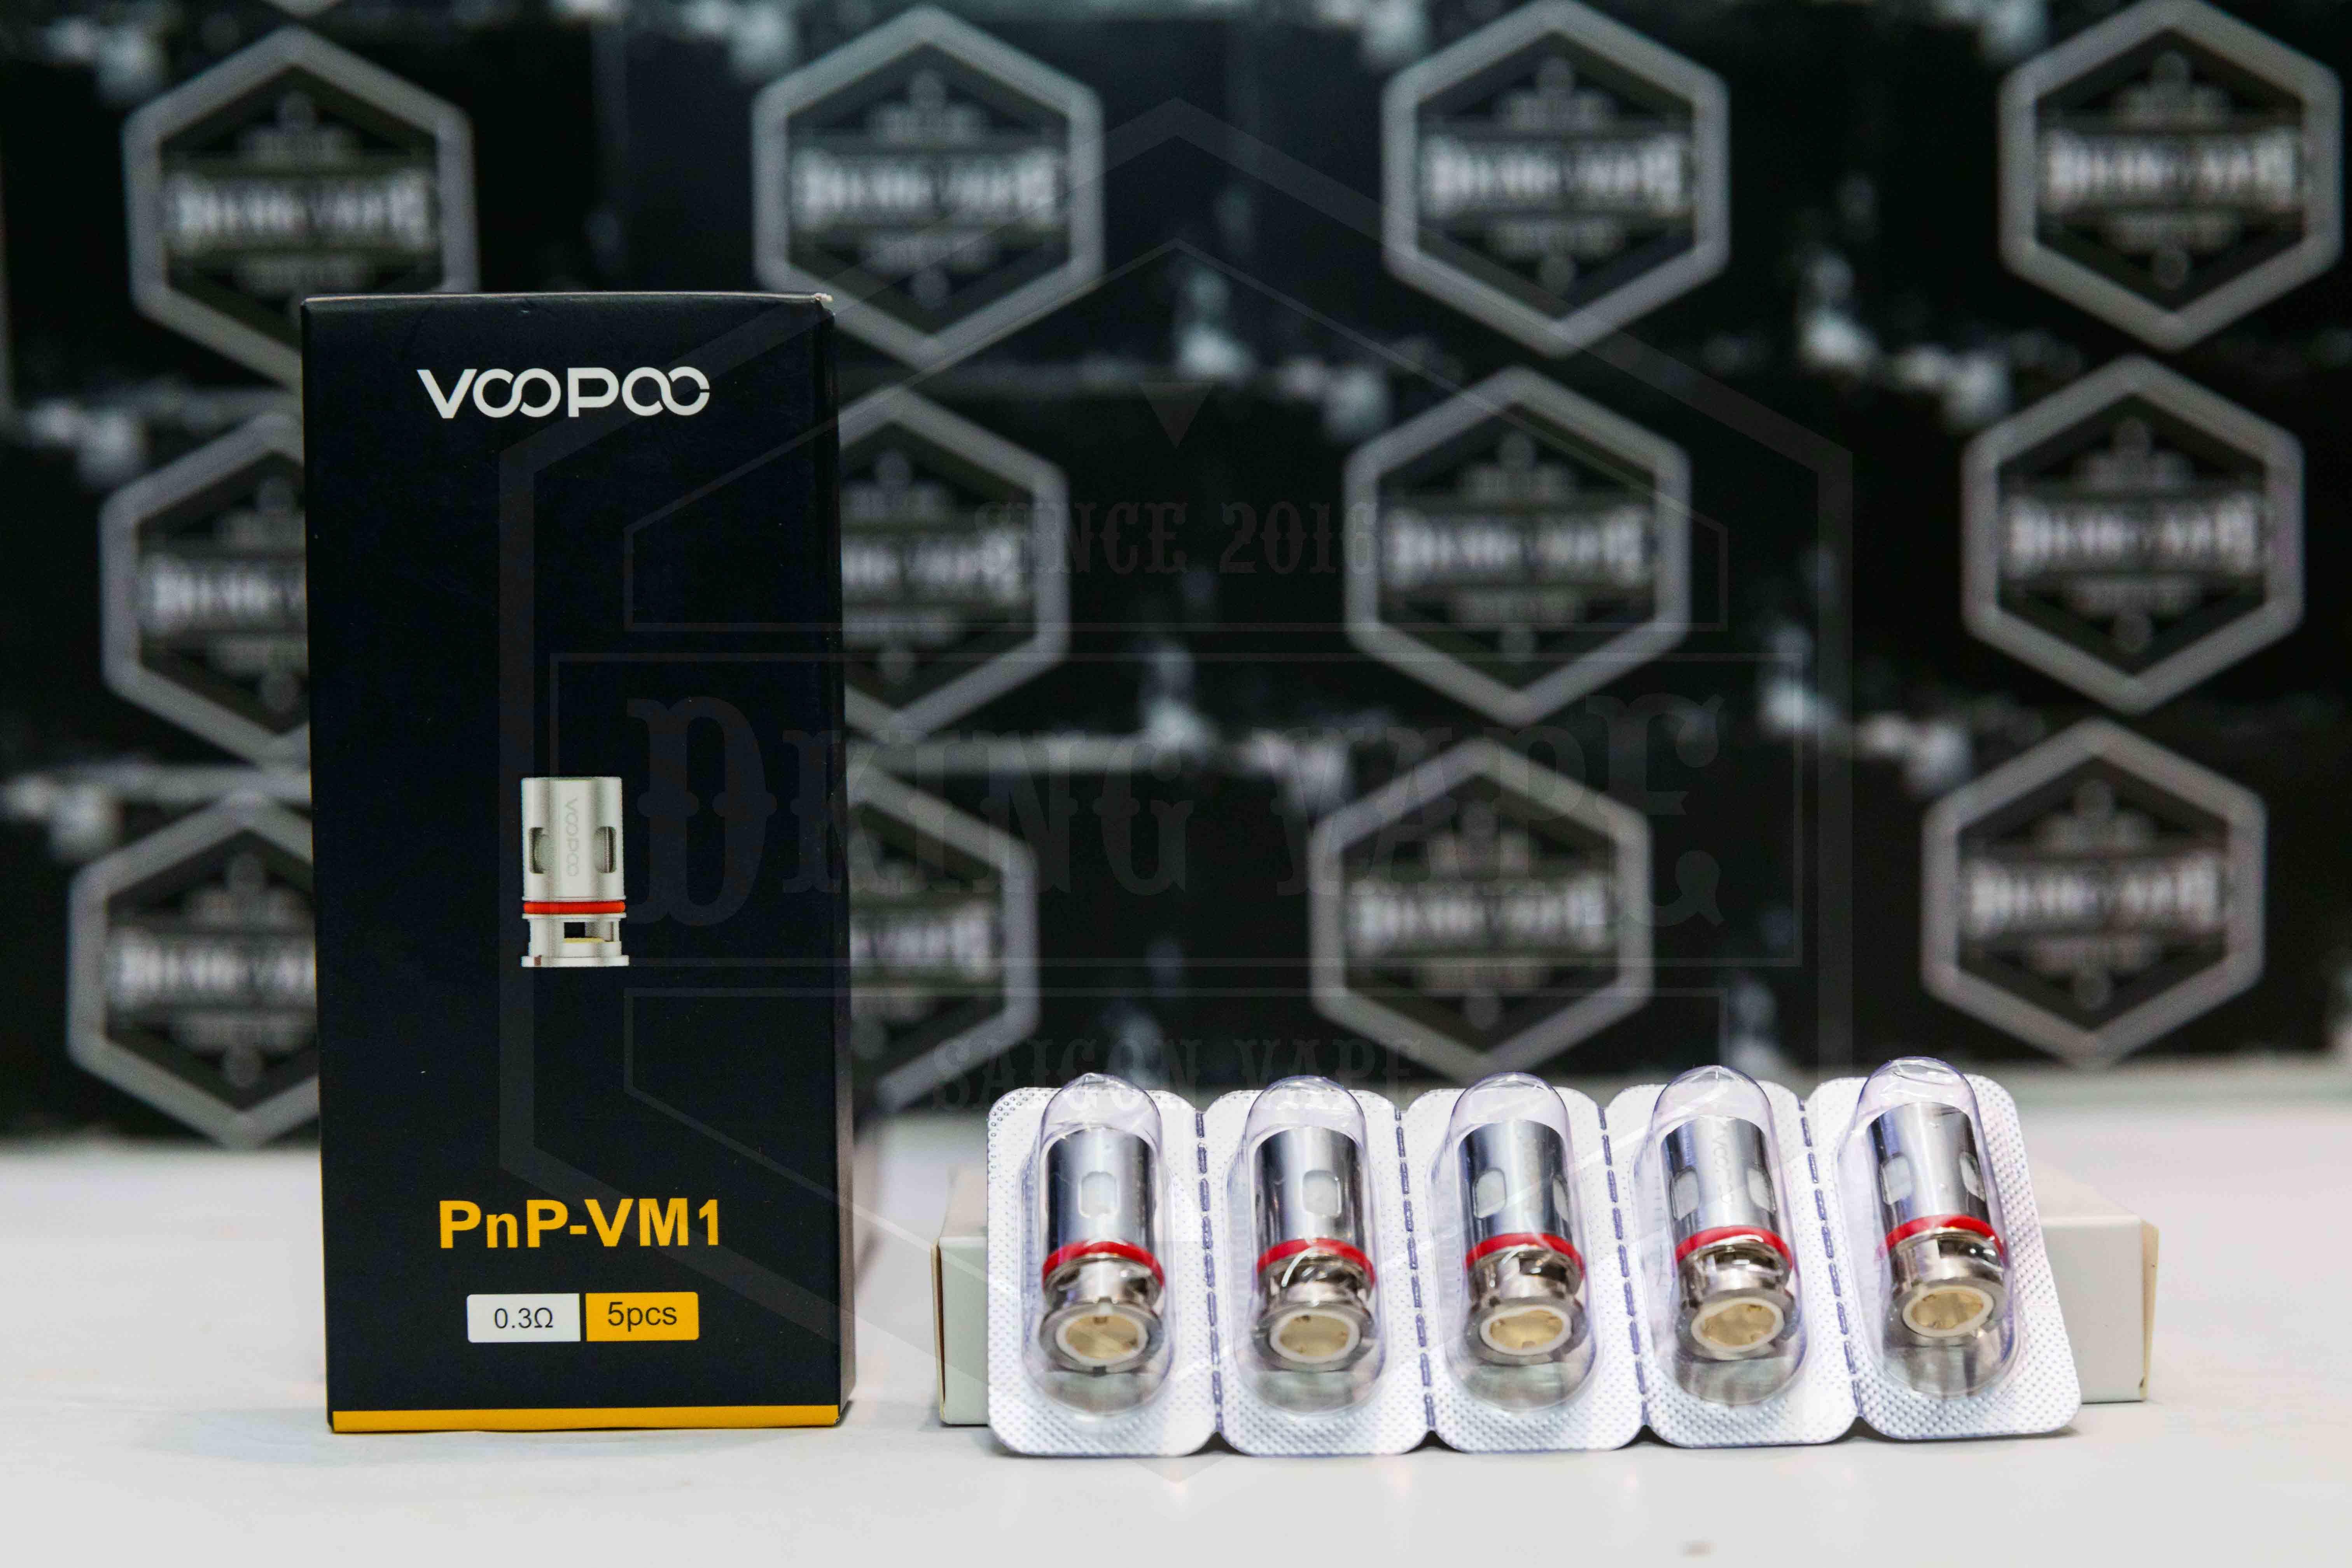 Occ Voopoo 0.3 PNP ( Vinci 40w, Vinci X, Navi )